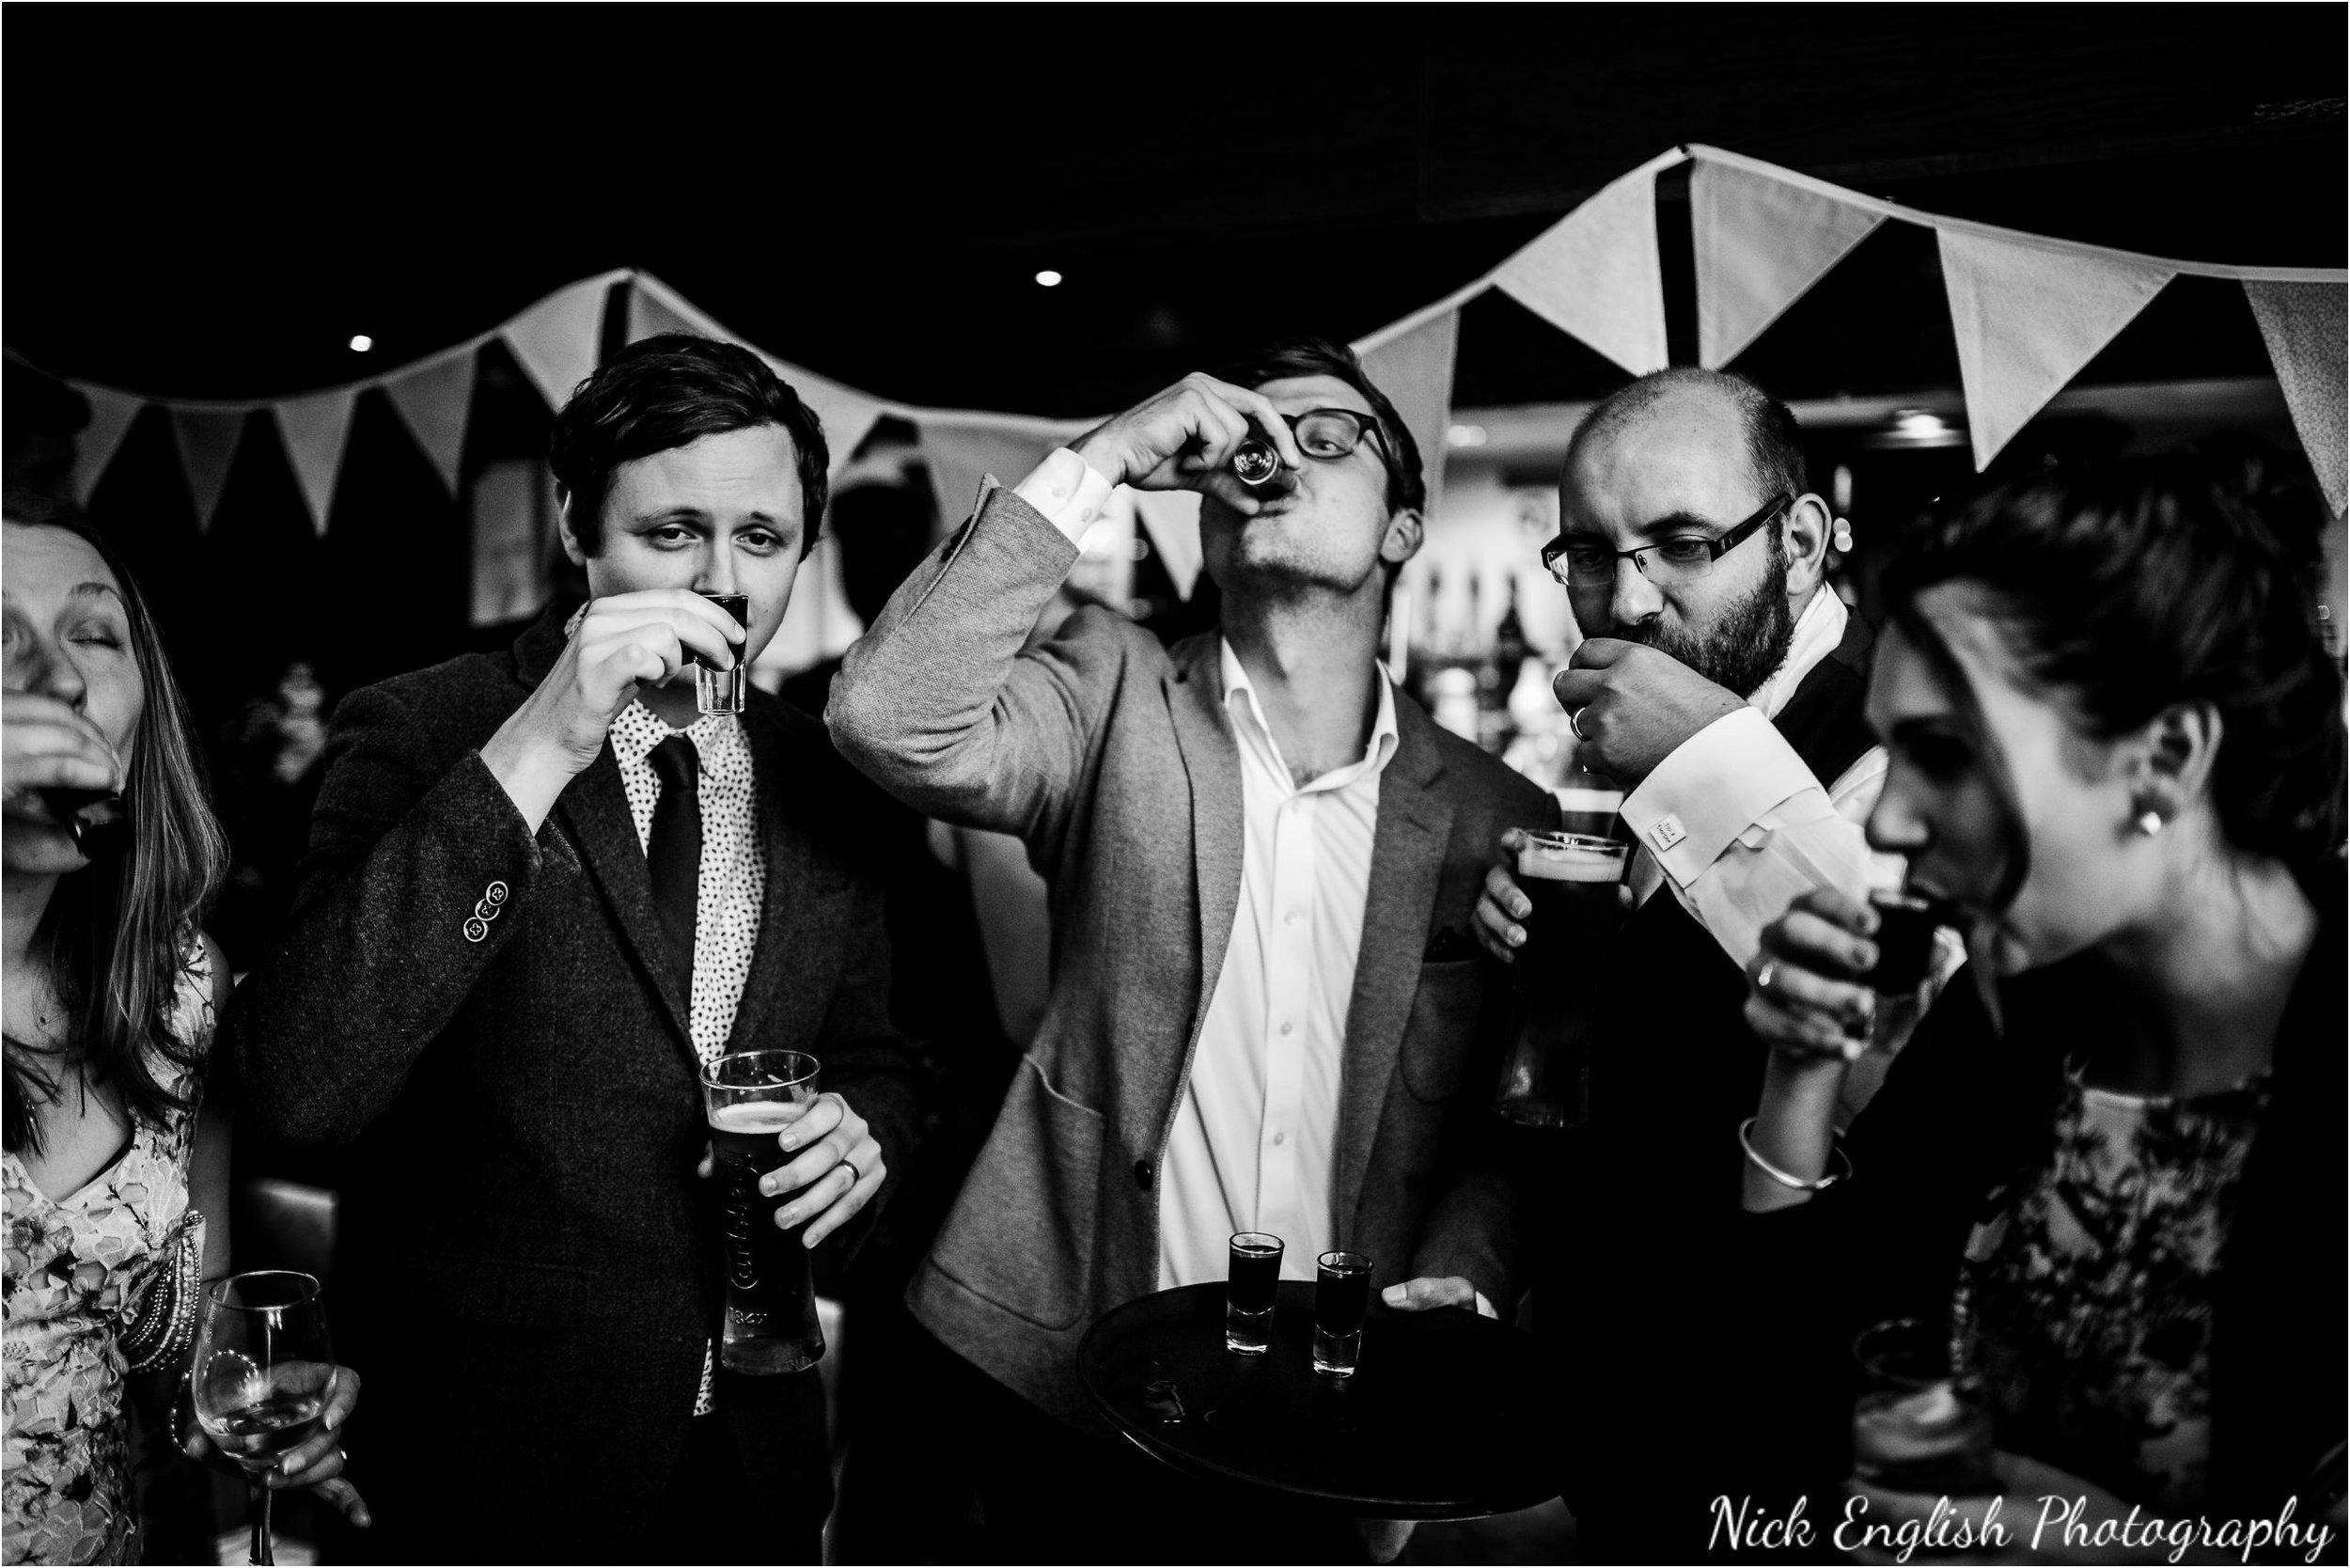 Emily David Wedding Photographs at Barton Grange Preston by Nick English Photography 215jpg.jpeg